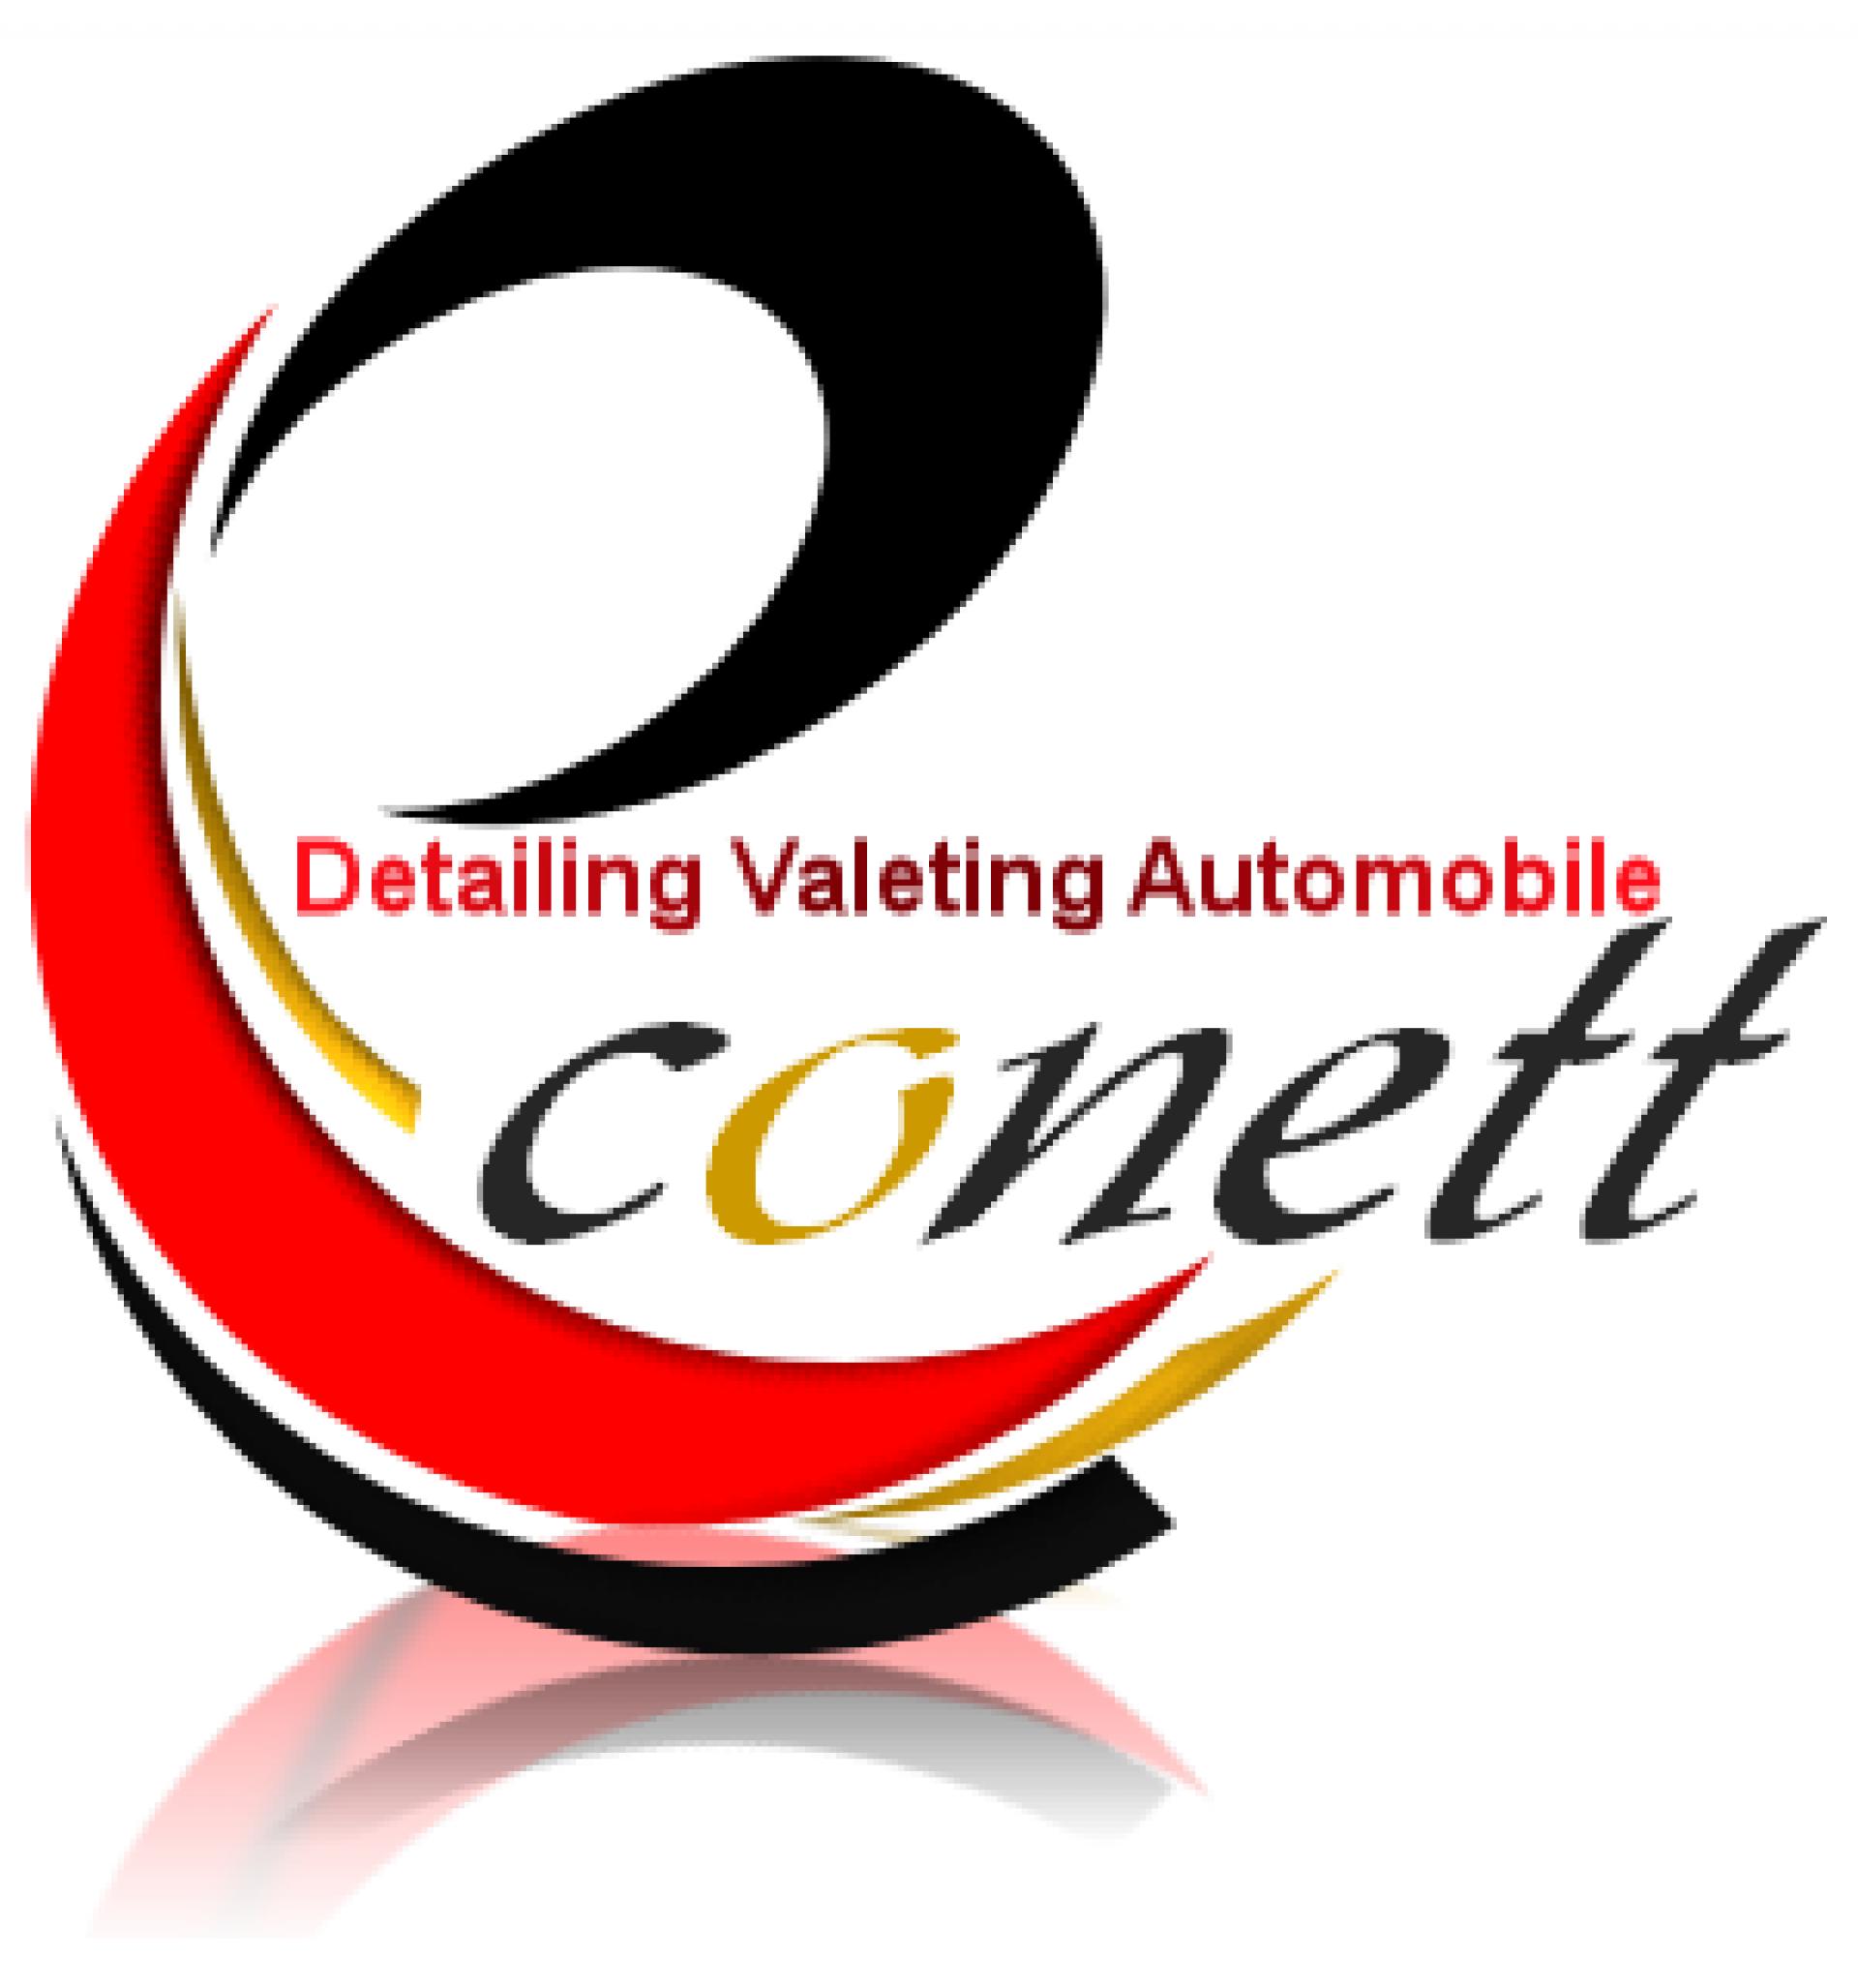 Eco-Nett Detailing Automobile  logo